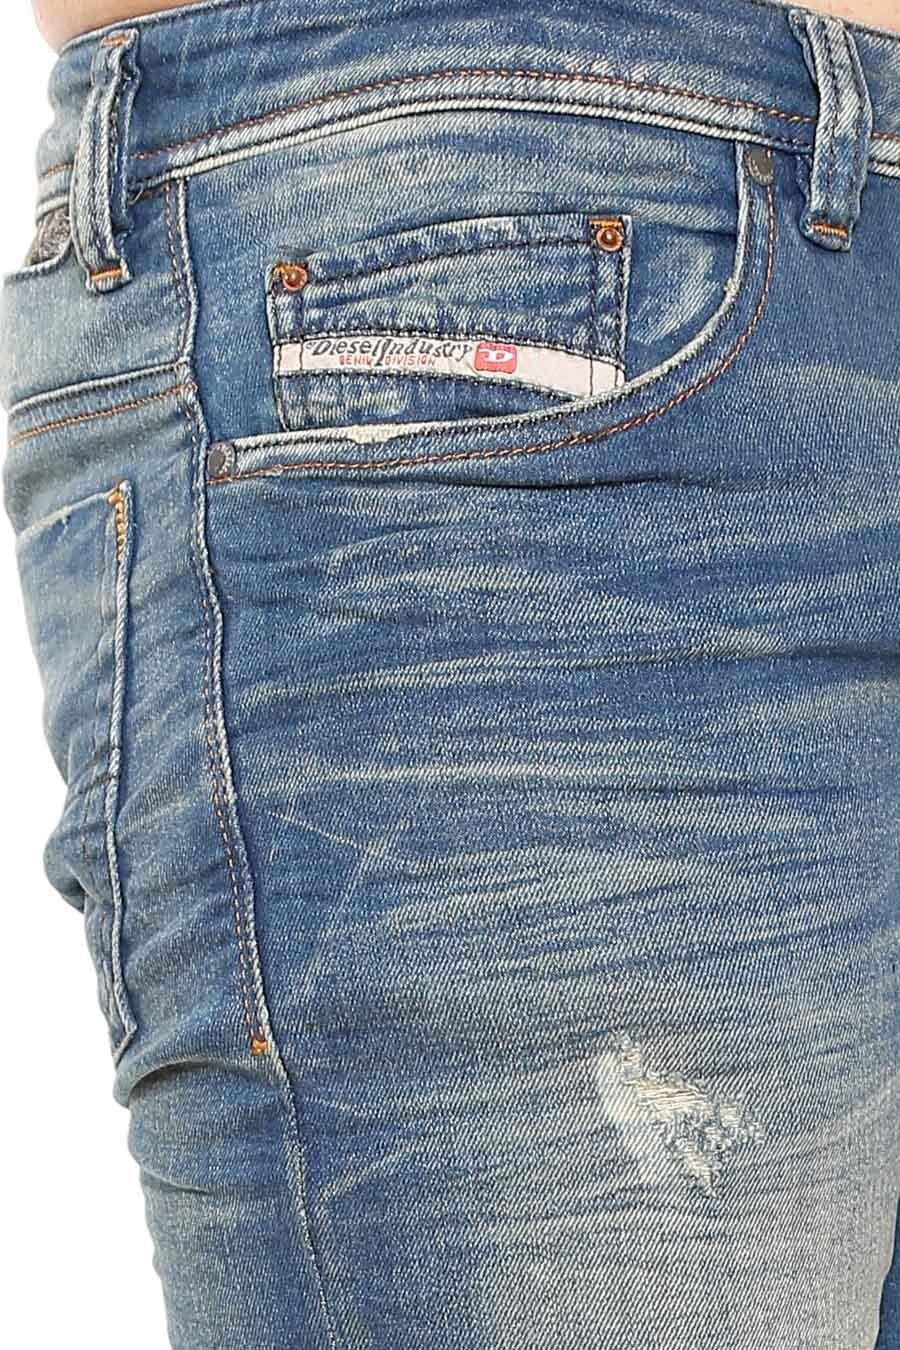 Vente pantalon diesel femme pas cher Gatorade Daim Vert Pas Chers ... e90727ec2a2